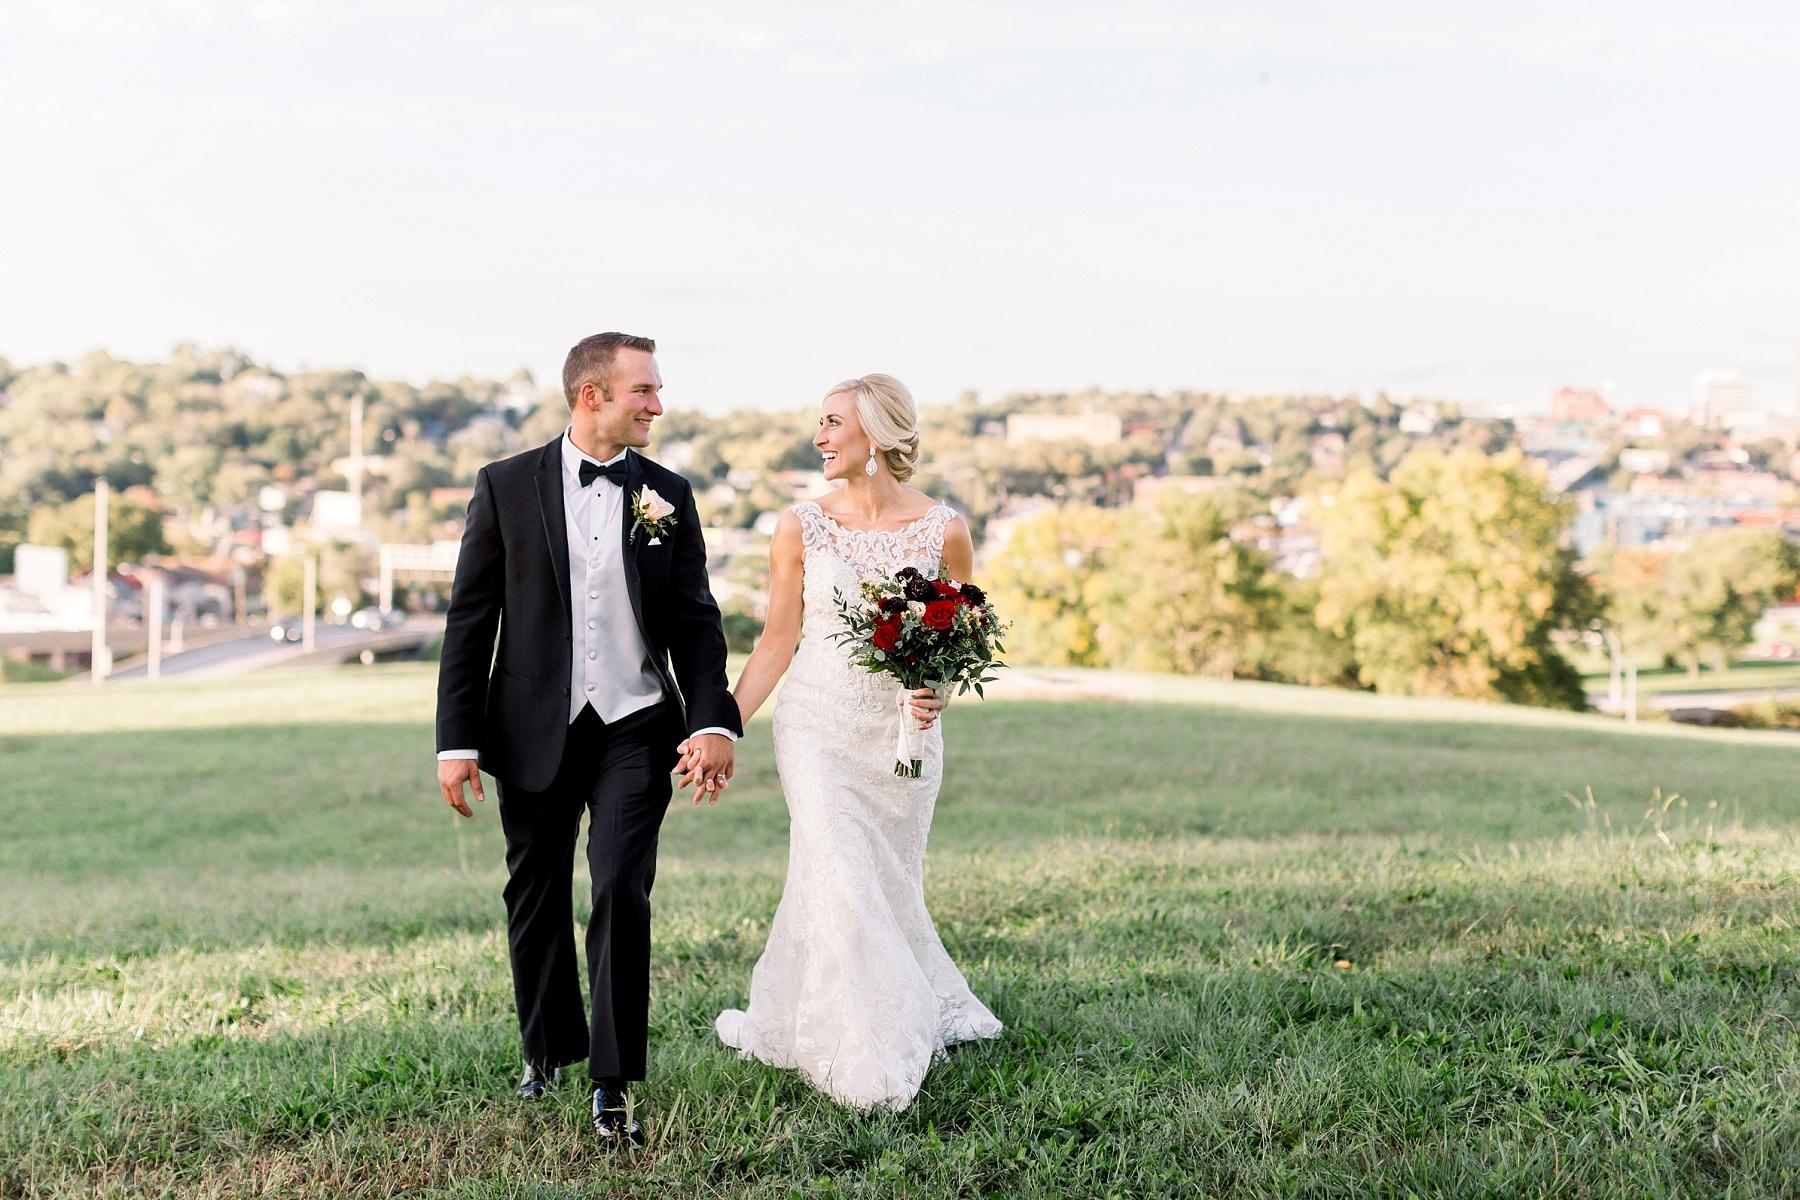 midwest-adventurous-wedding-photographer-elizabeth-ladean-photography-photo_4797.jpg